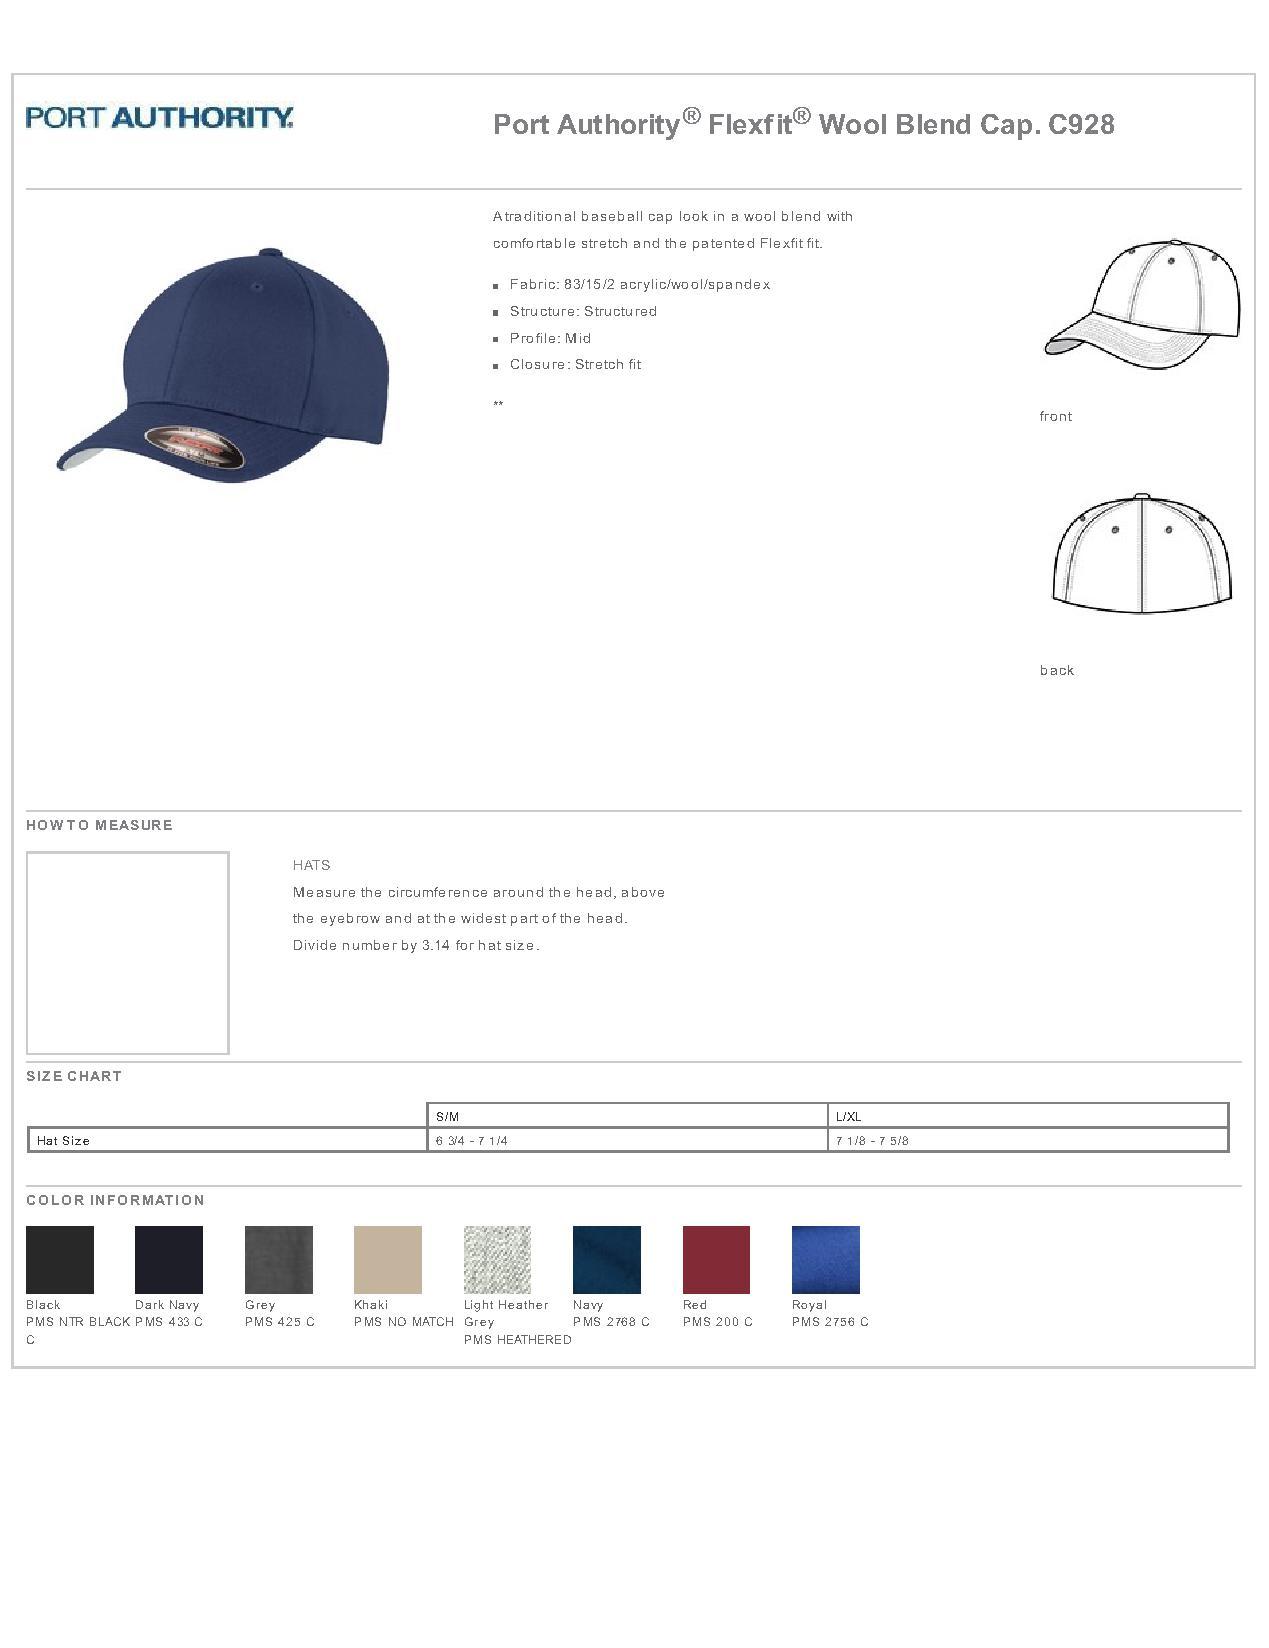 a939985a0 Port Authority® Flexfit® C928 - Wool Blend Cap $10.29 - Headwear